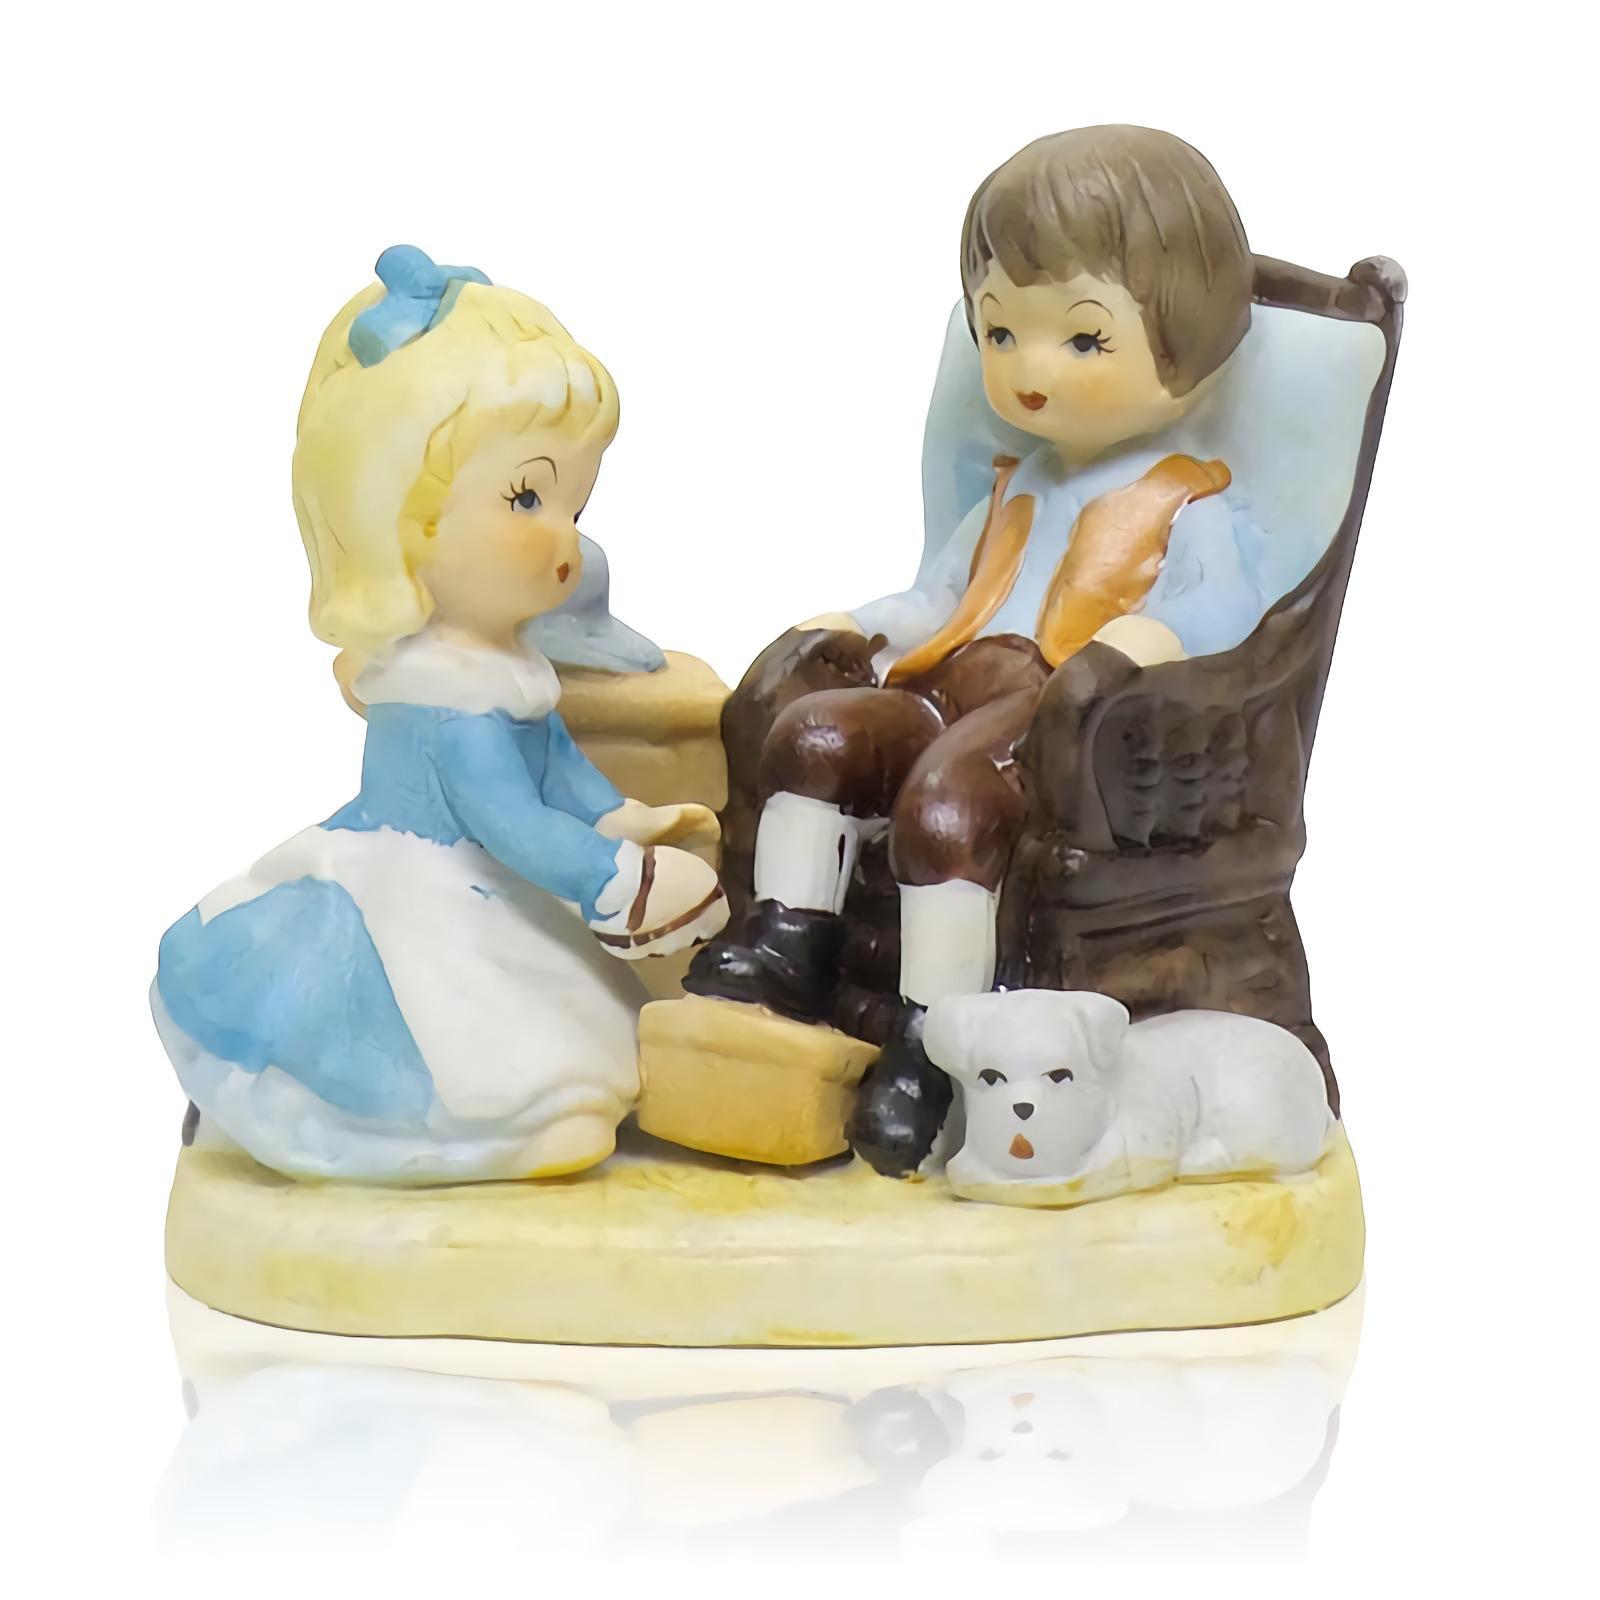 OHOME Patung Pajangan EK-P-1503 Polystone Couple Porcelain Porselin Dekorasi Interior Warni